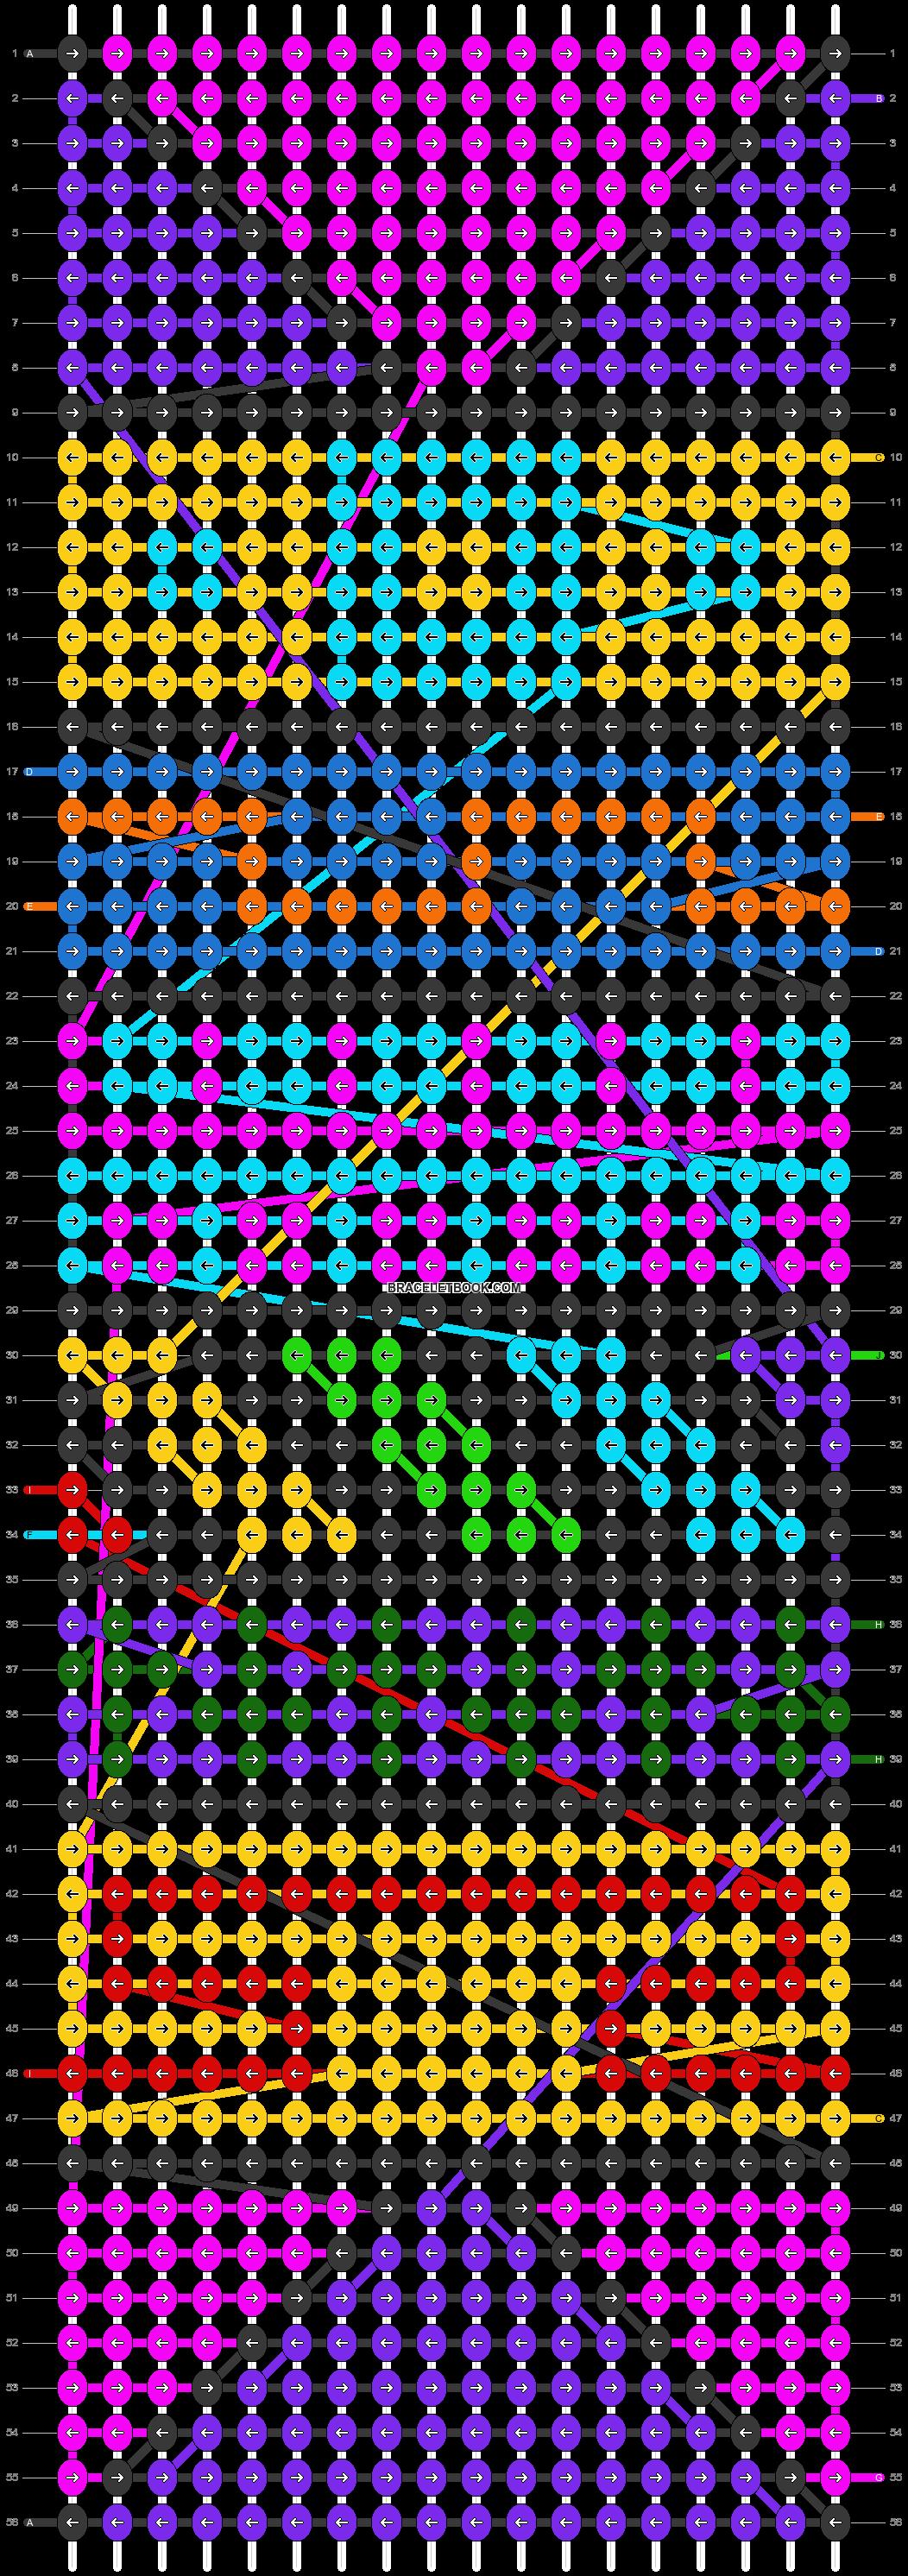 Alpha Pattern #22539 added by javi2438